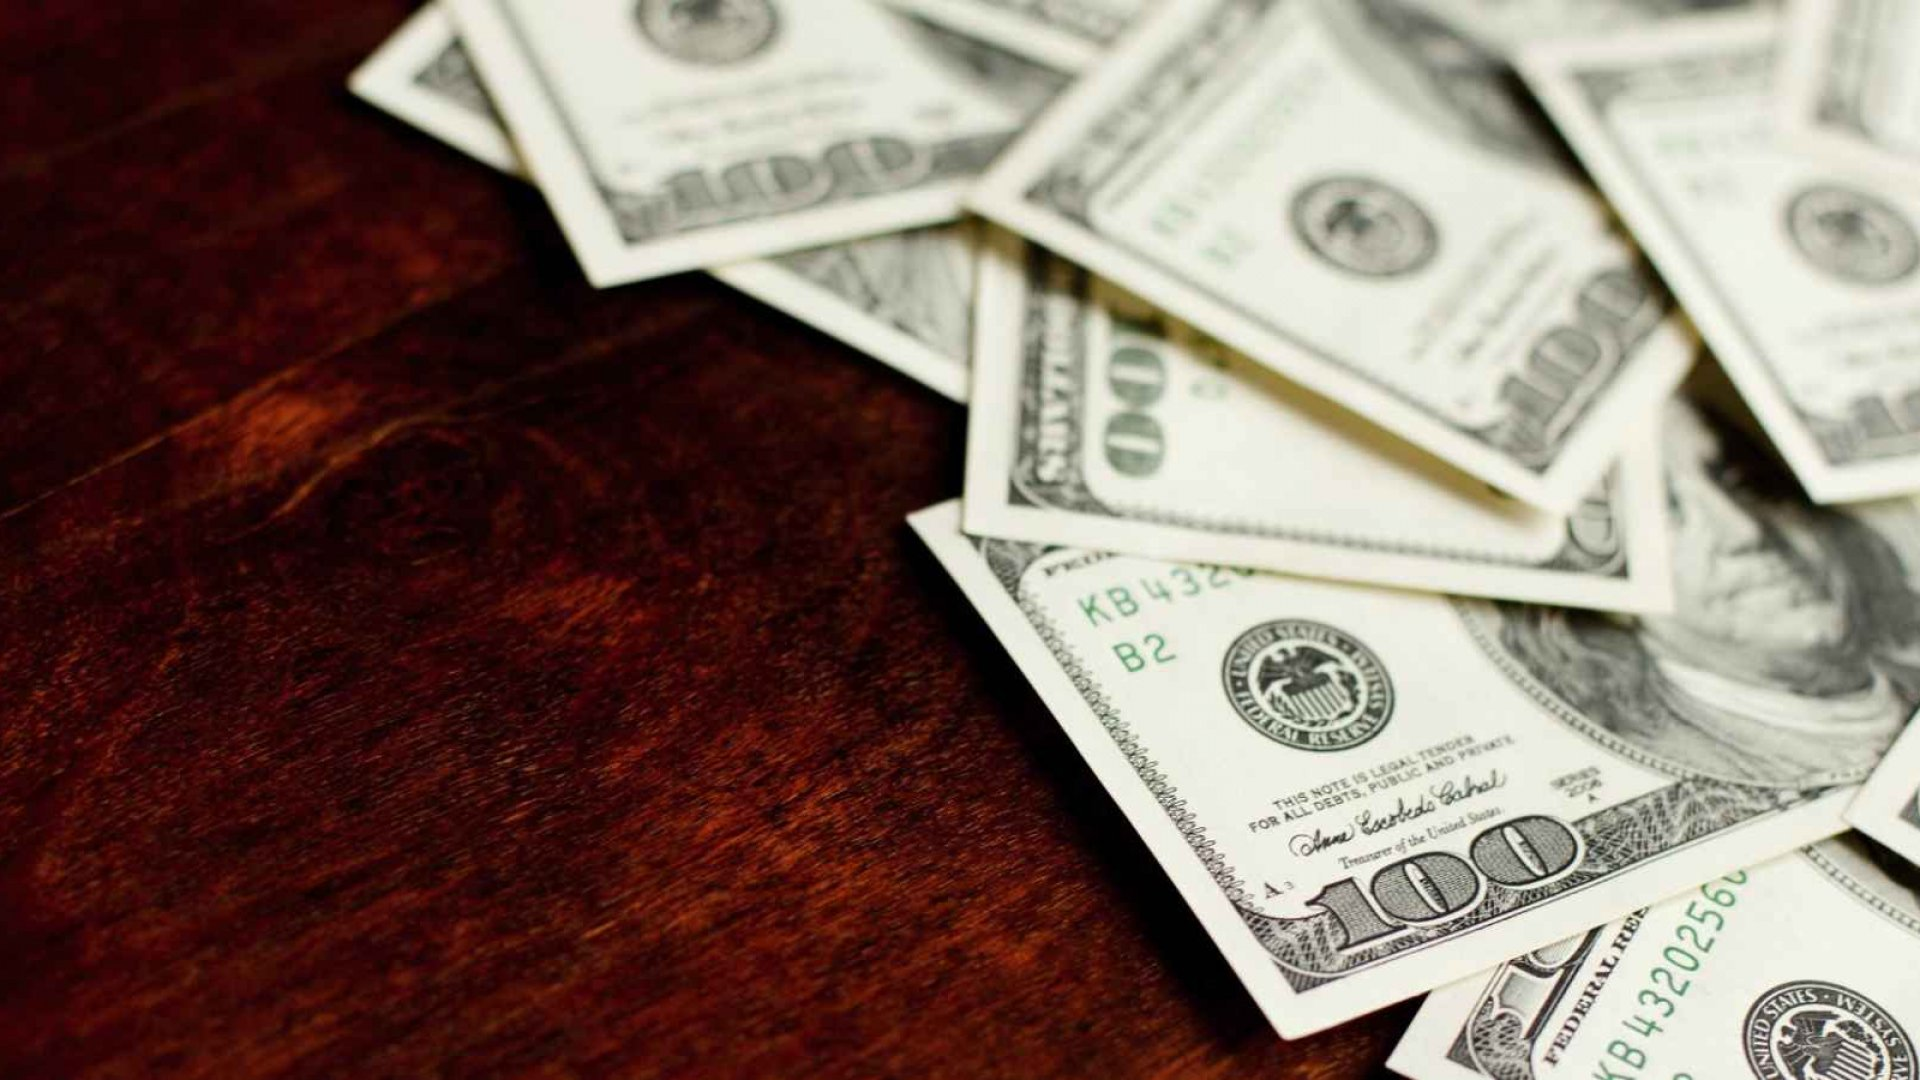 How Discrimination Is Costing the U.S. $300 Billion